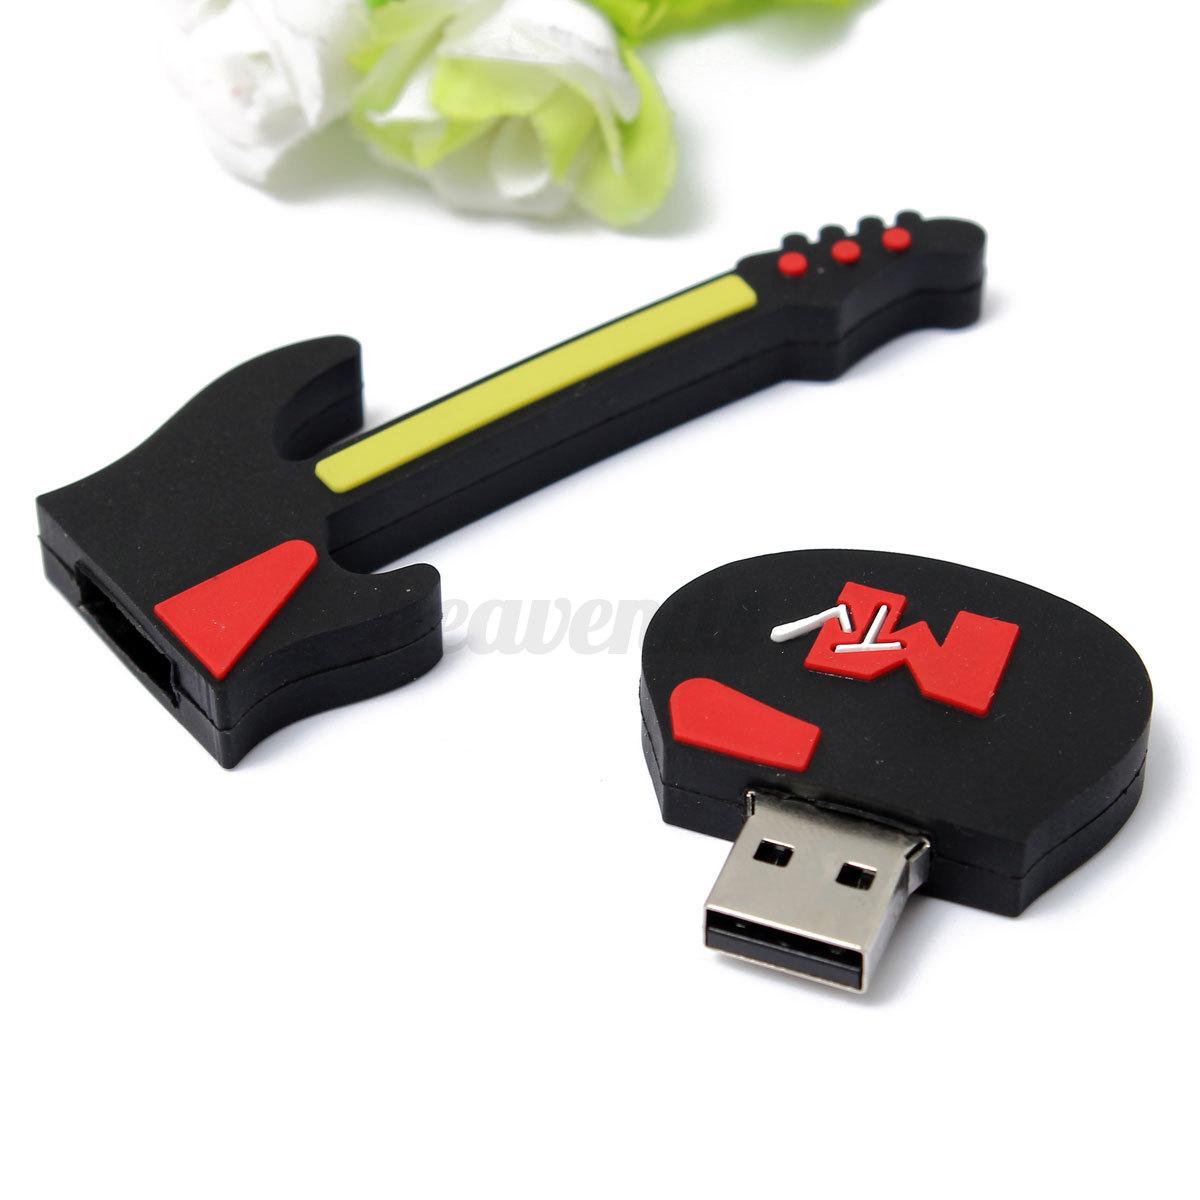 32 64 g go gb cle usb 2 0 guitar key m moire flash drive. Black Bedroom Furniture Sets. Home Design Ideas